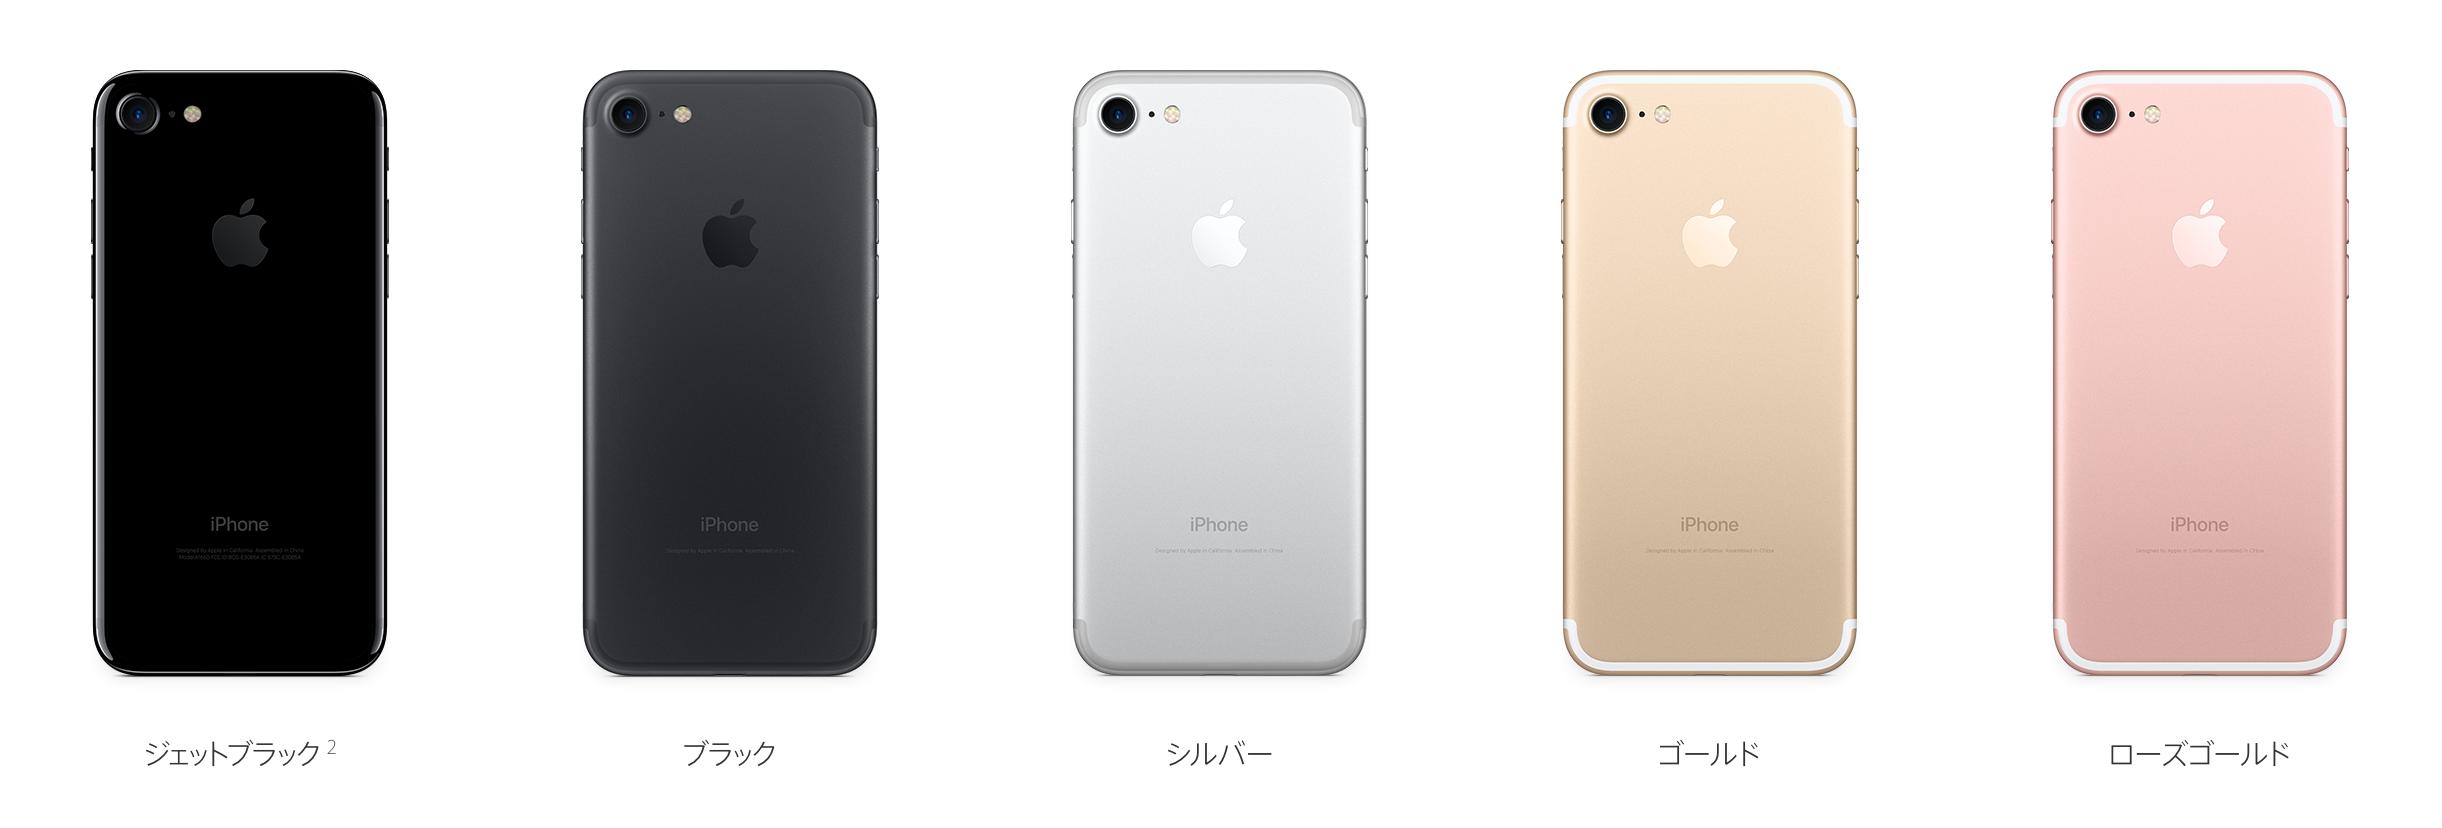 iPhone 7/iPhone 7 Plusの予約が9/9から開始!スペック・価格・カメラ性能まとめ